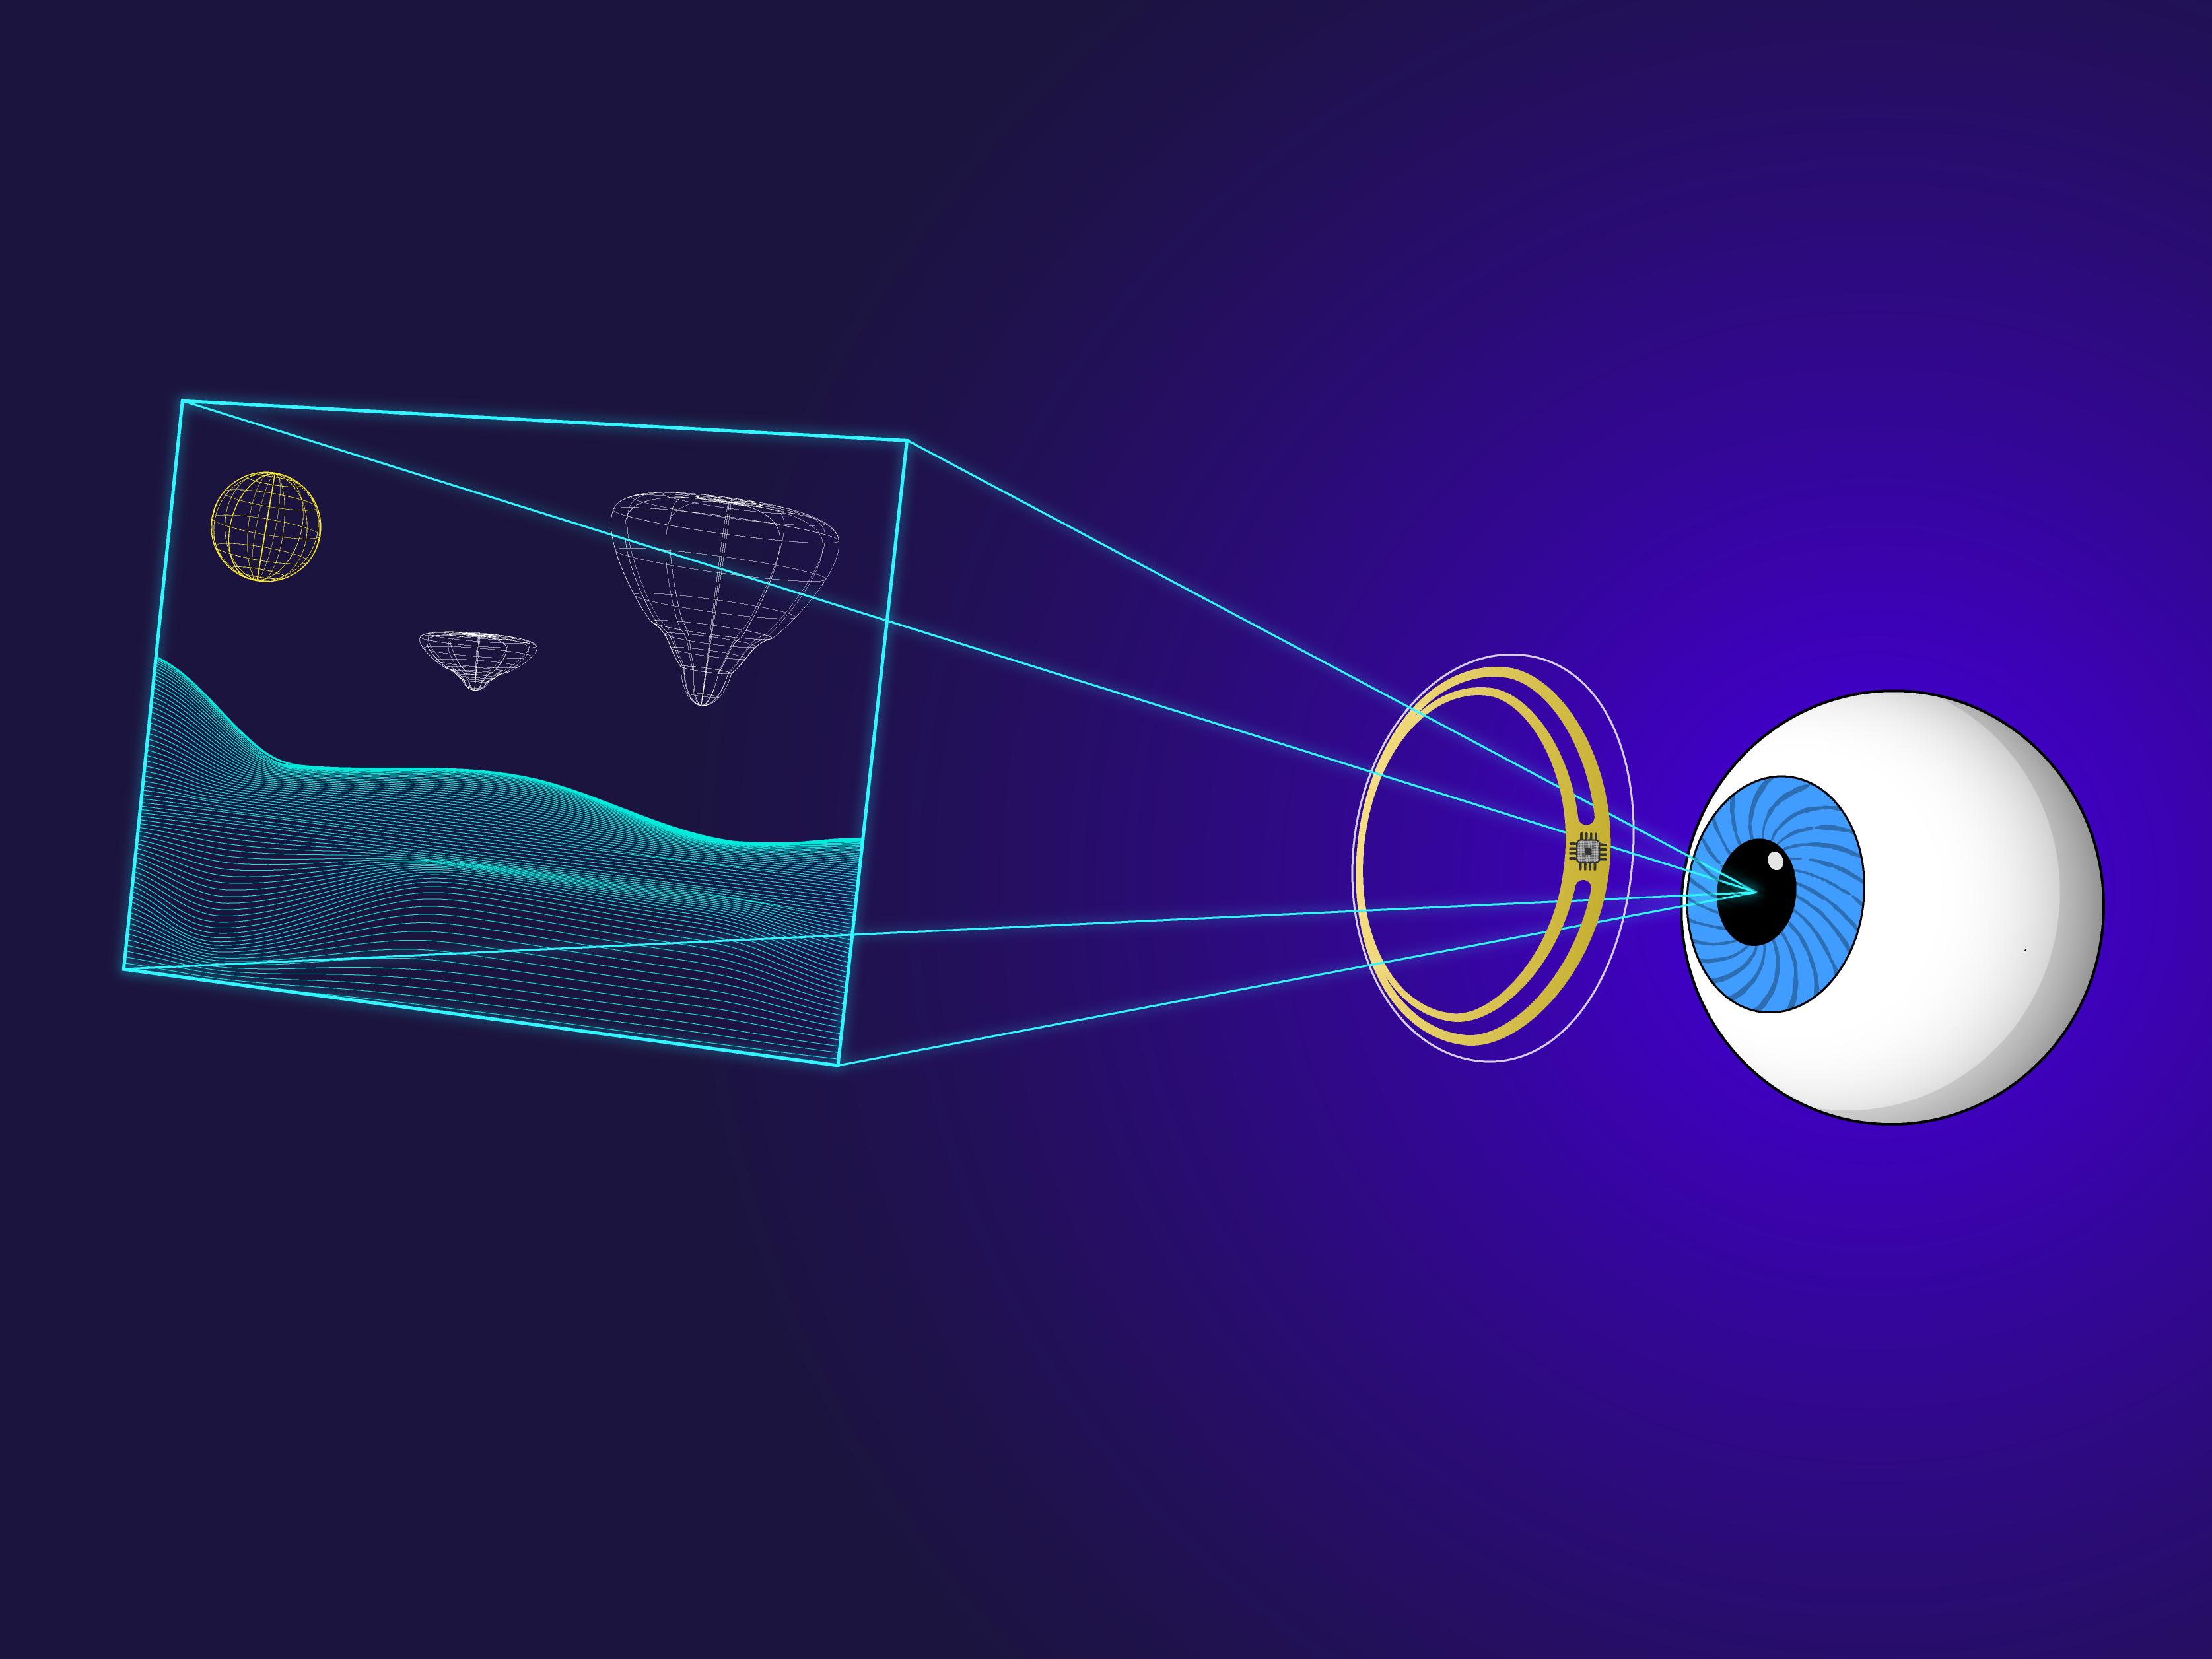 Design Fiction about a Virtual Reality Lens Concept